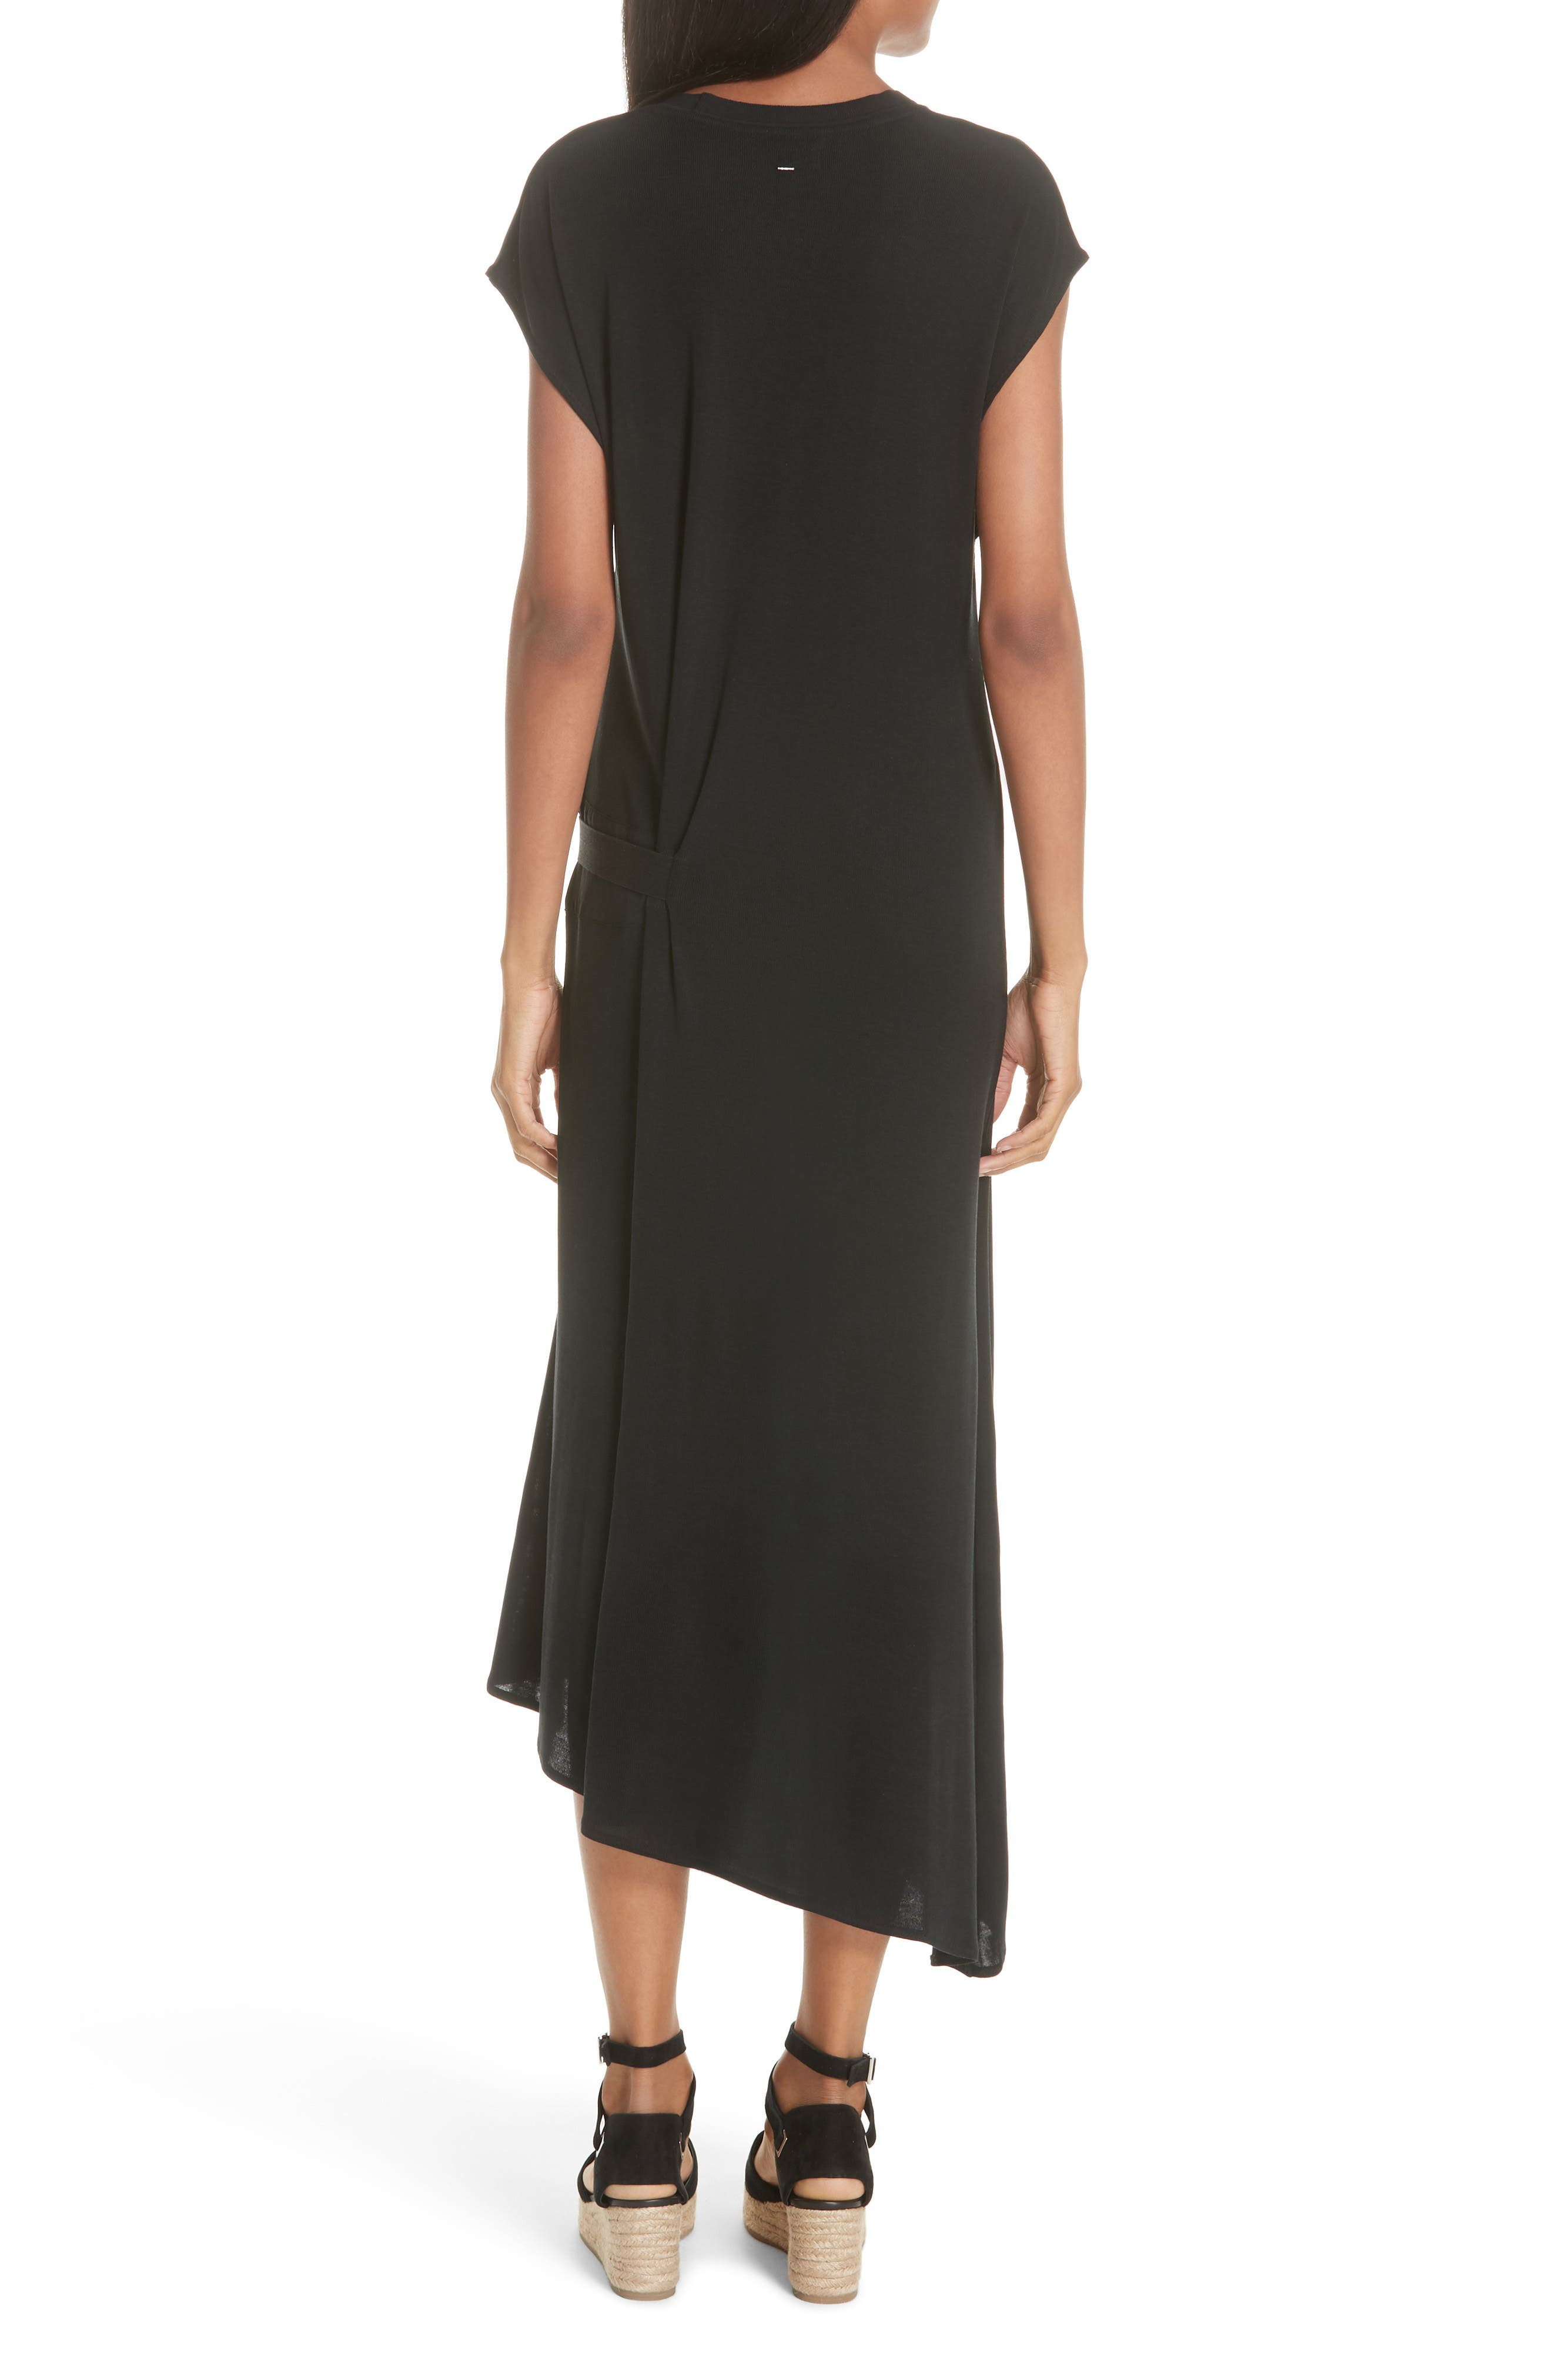 Ophelia Asymmetrical Dress,                             Alternate thumbnail 2, color,                             001